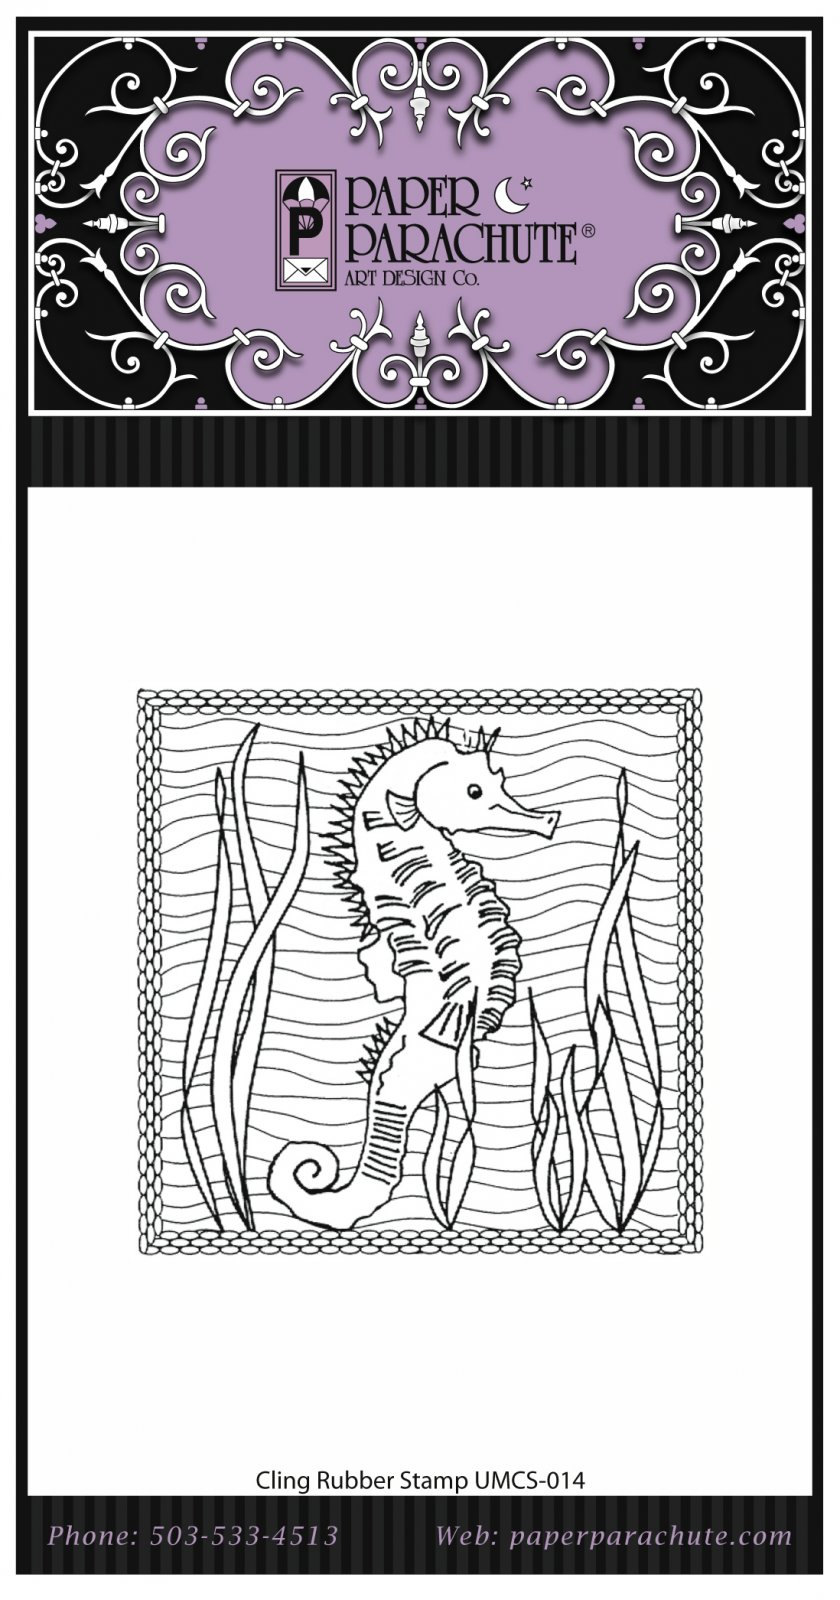 Paper Parachute Rubber Stamp - UMCS14